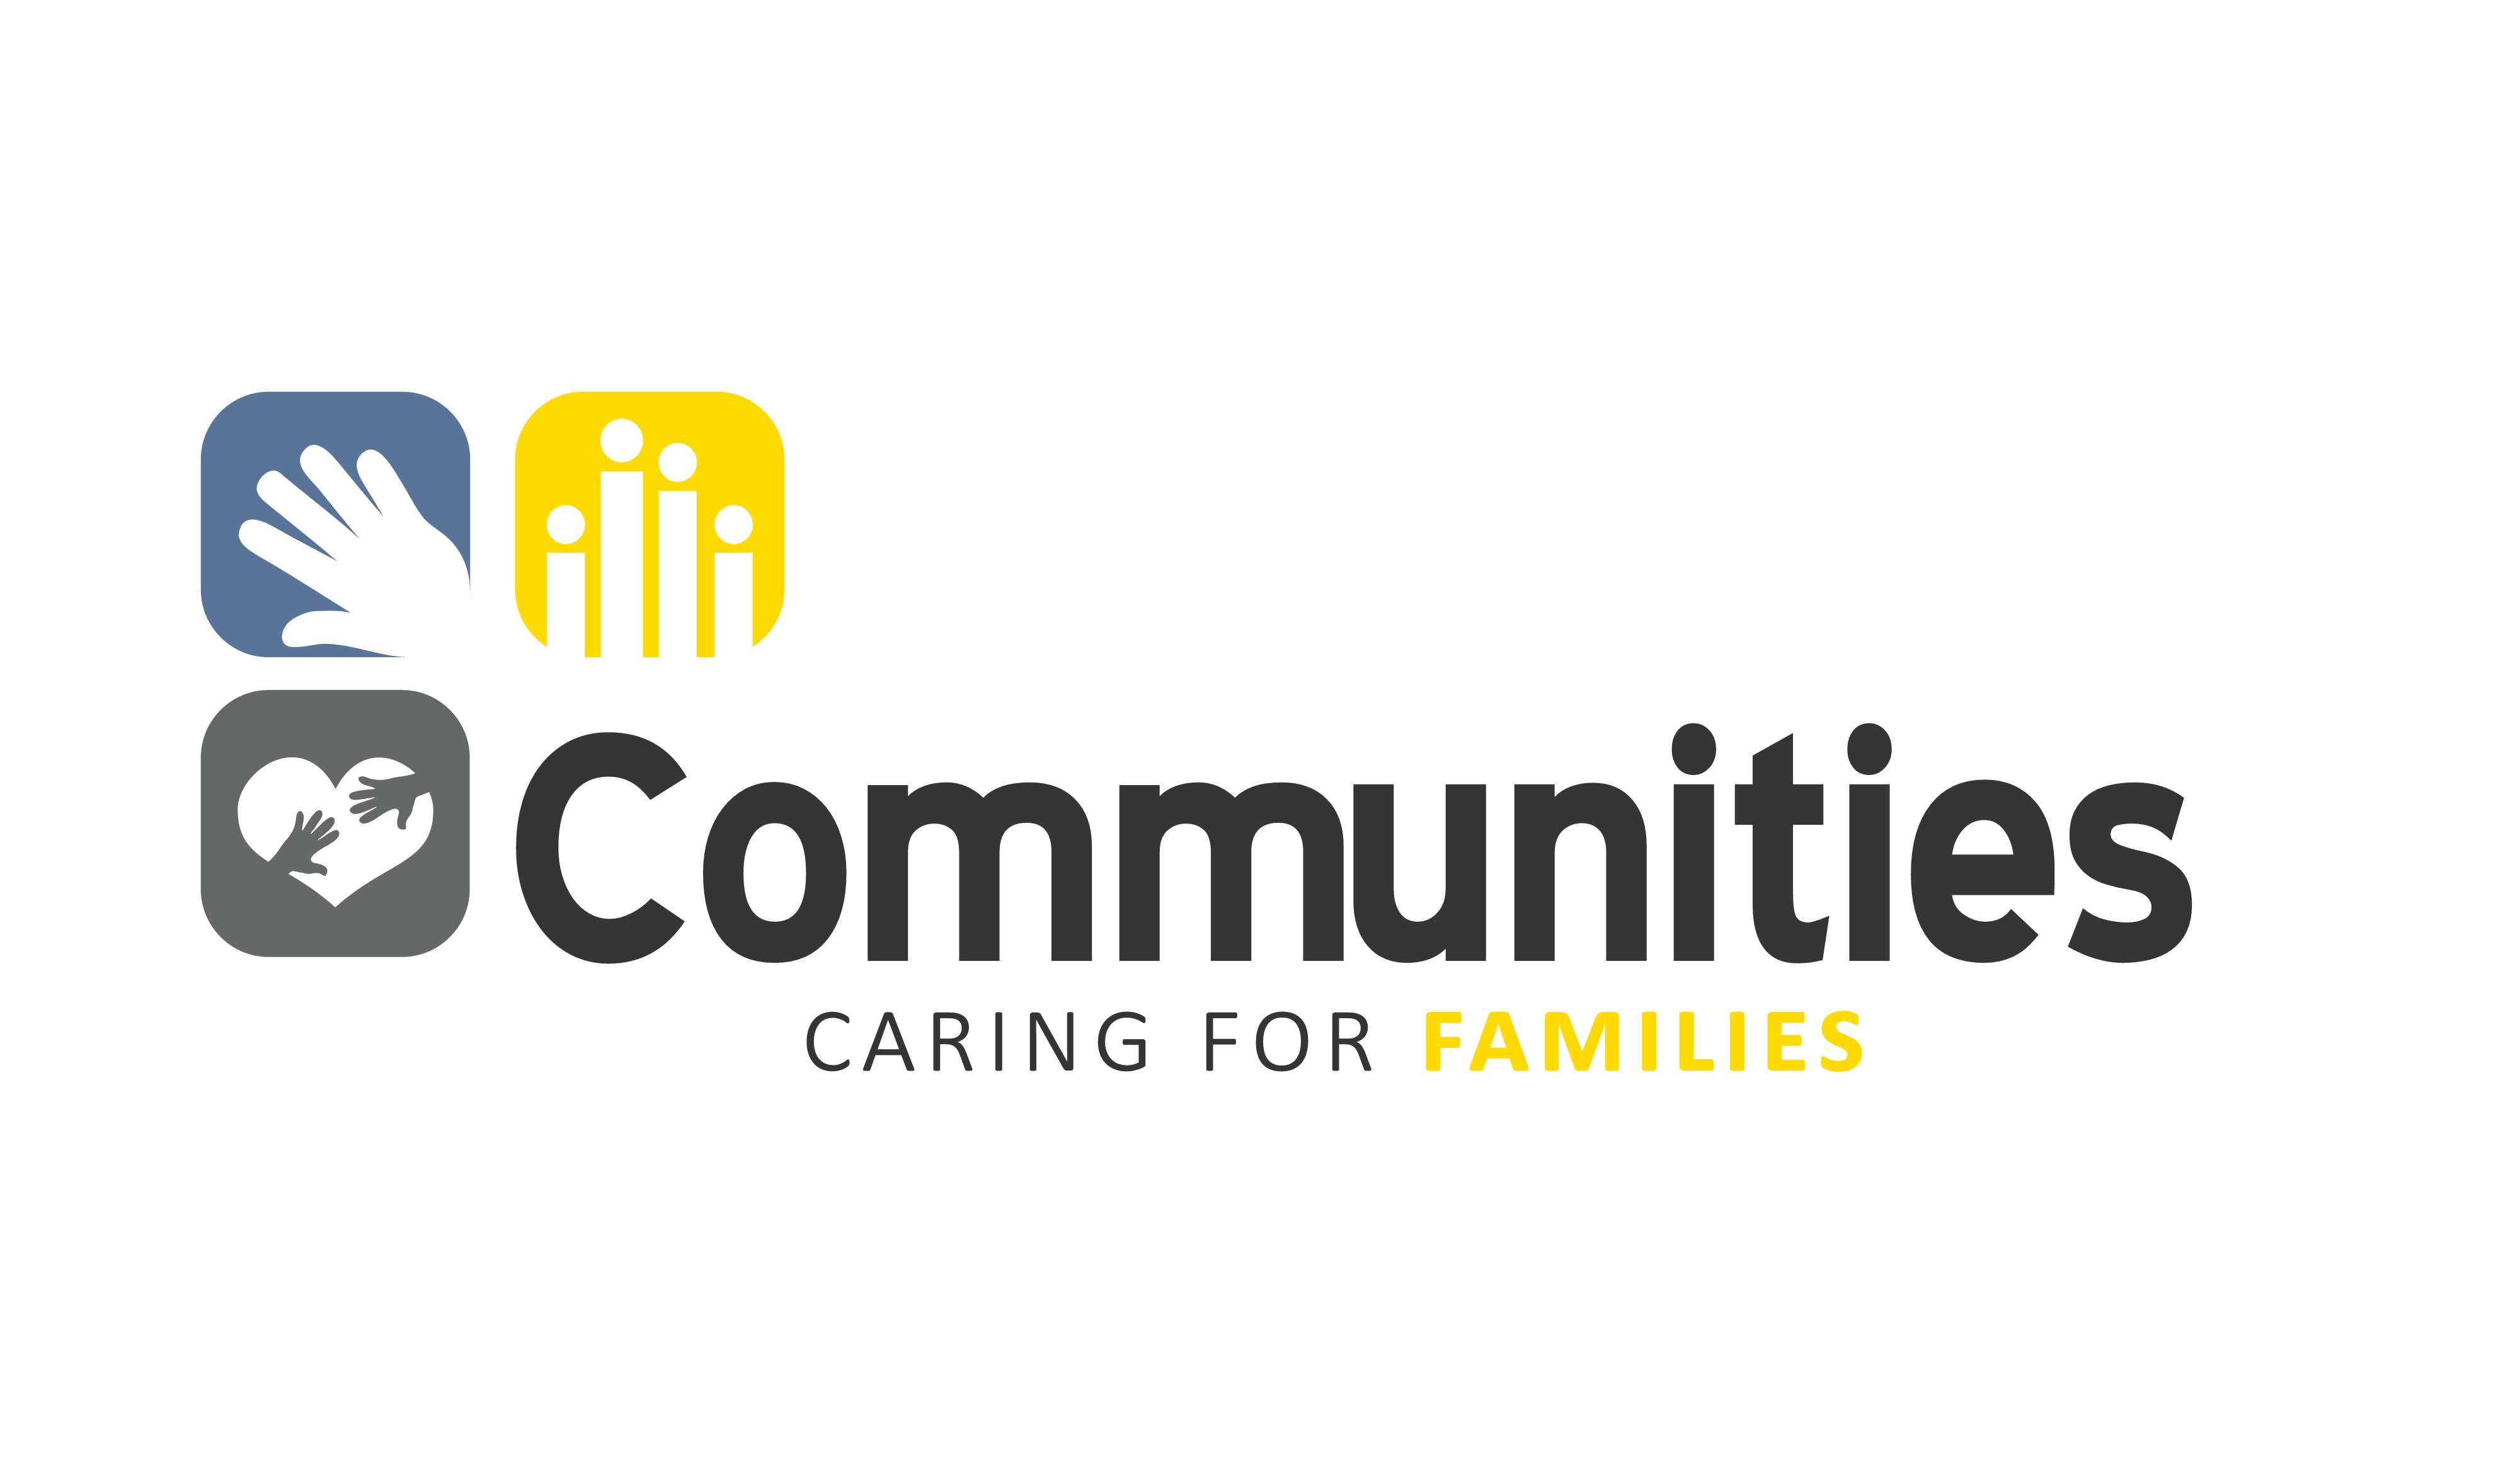 Communities Caring for Families - Non Profit